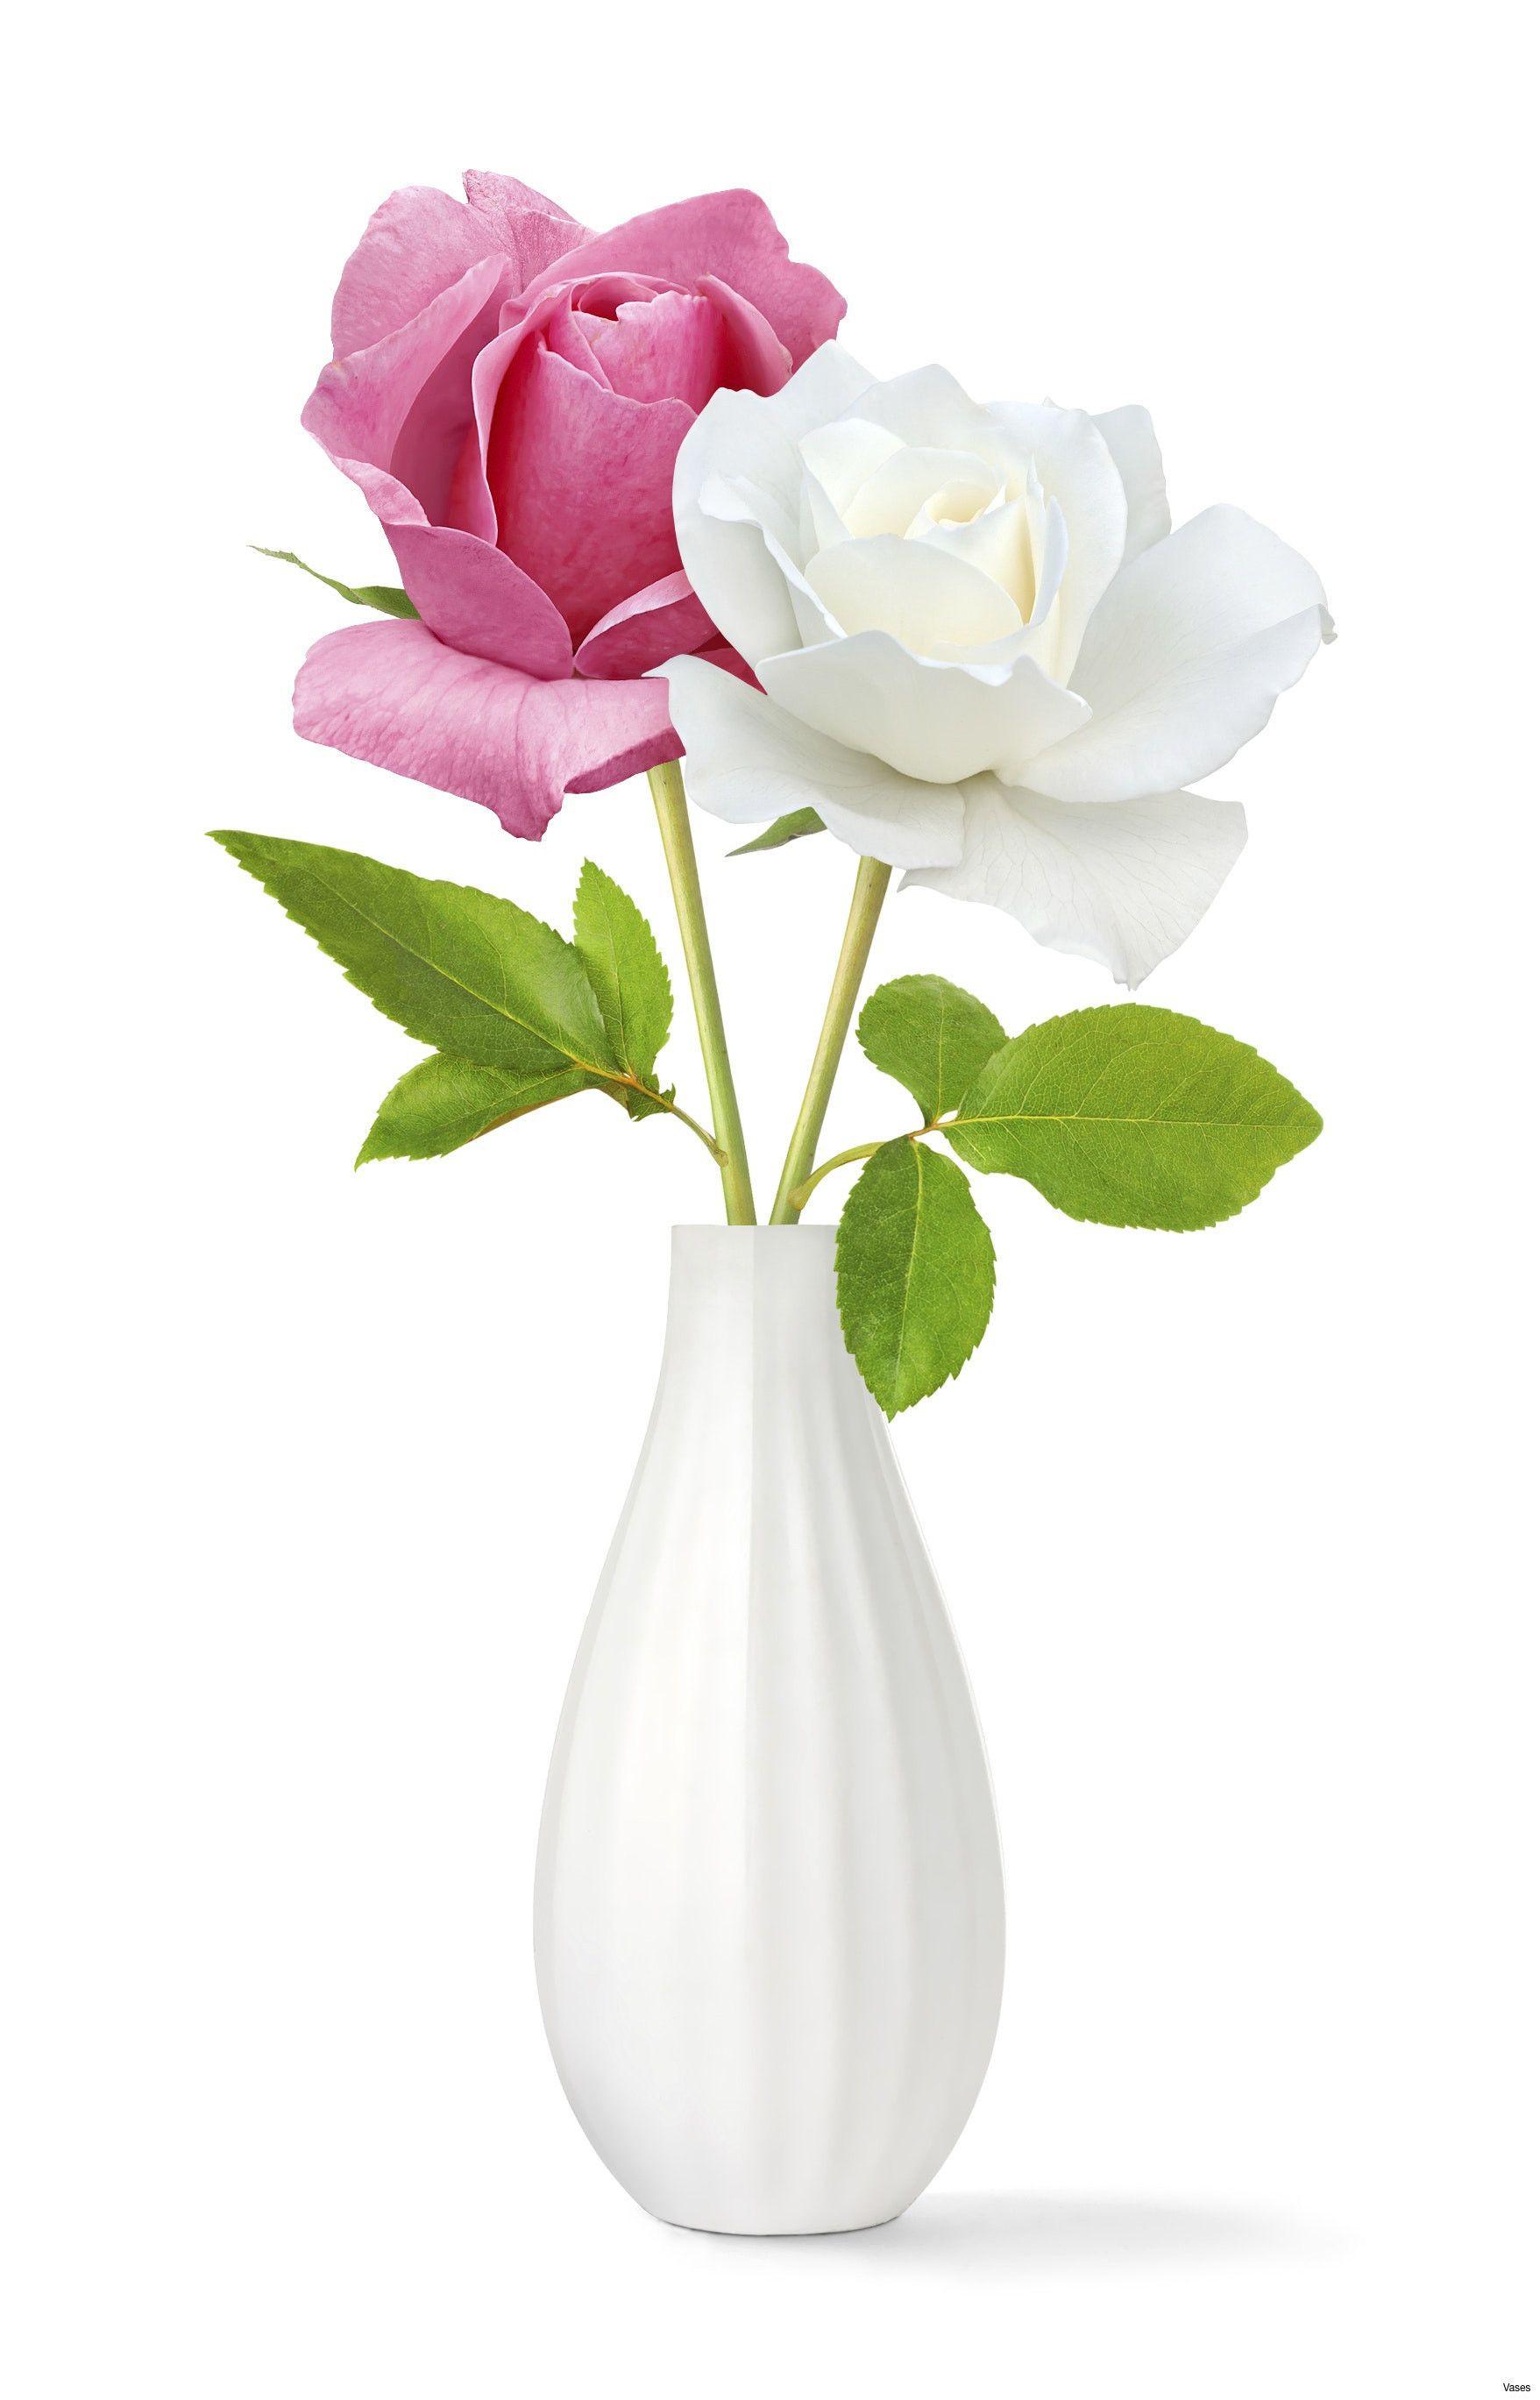 white bud vase of light pink vase elegant roses red in a vase singleh vases rose with light pink vase elegant roses red in a vase singleh vases rose single i 0d scheme